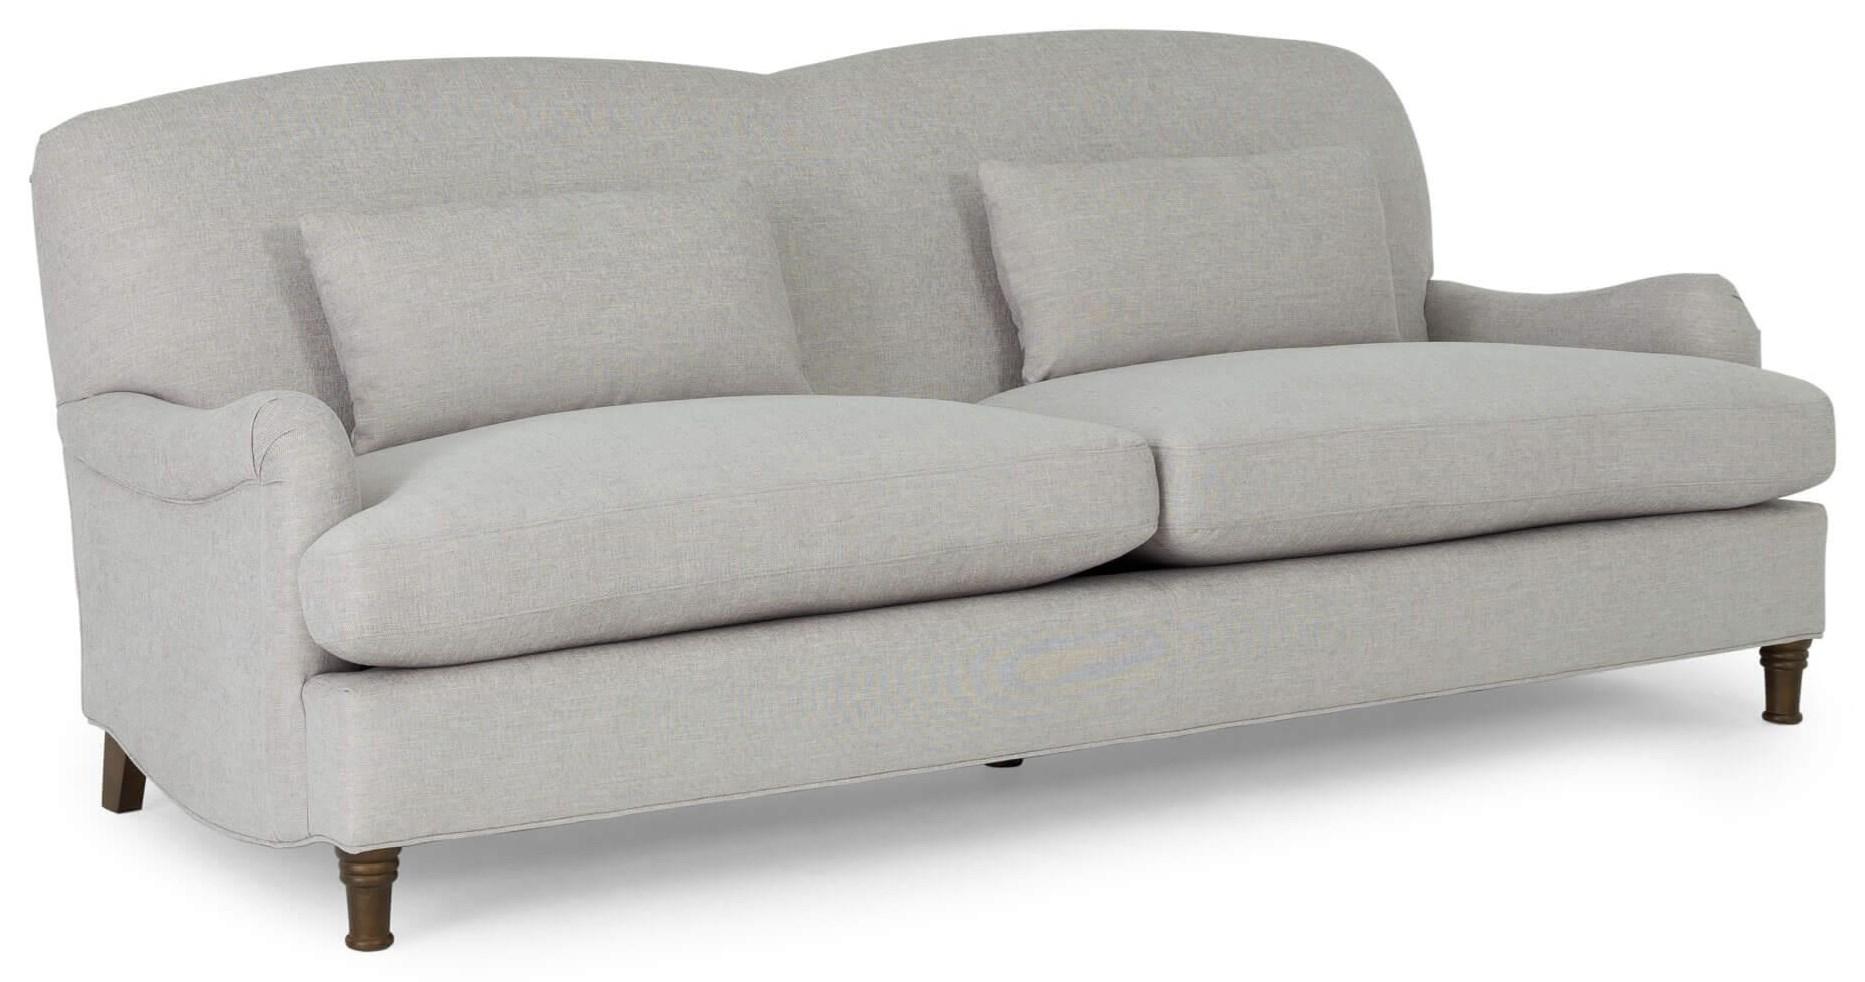 Sarah Richardson Vantage Apartment Sofa by Palliser at Stoney Creek Furniture